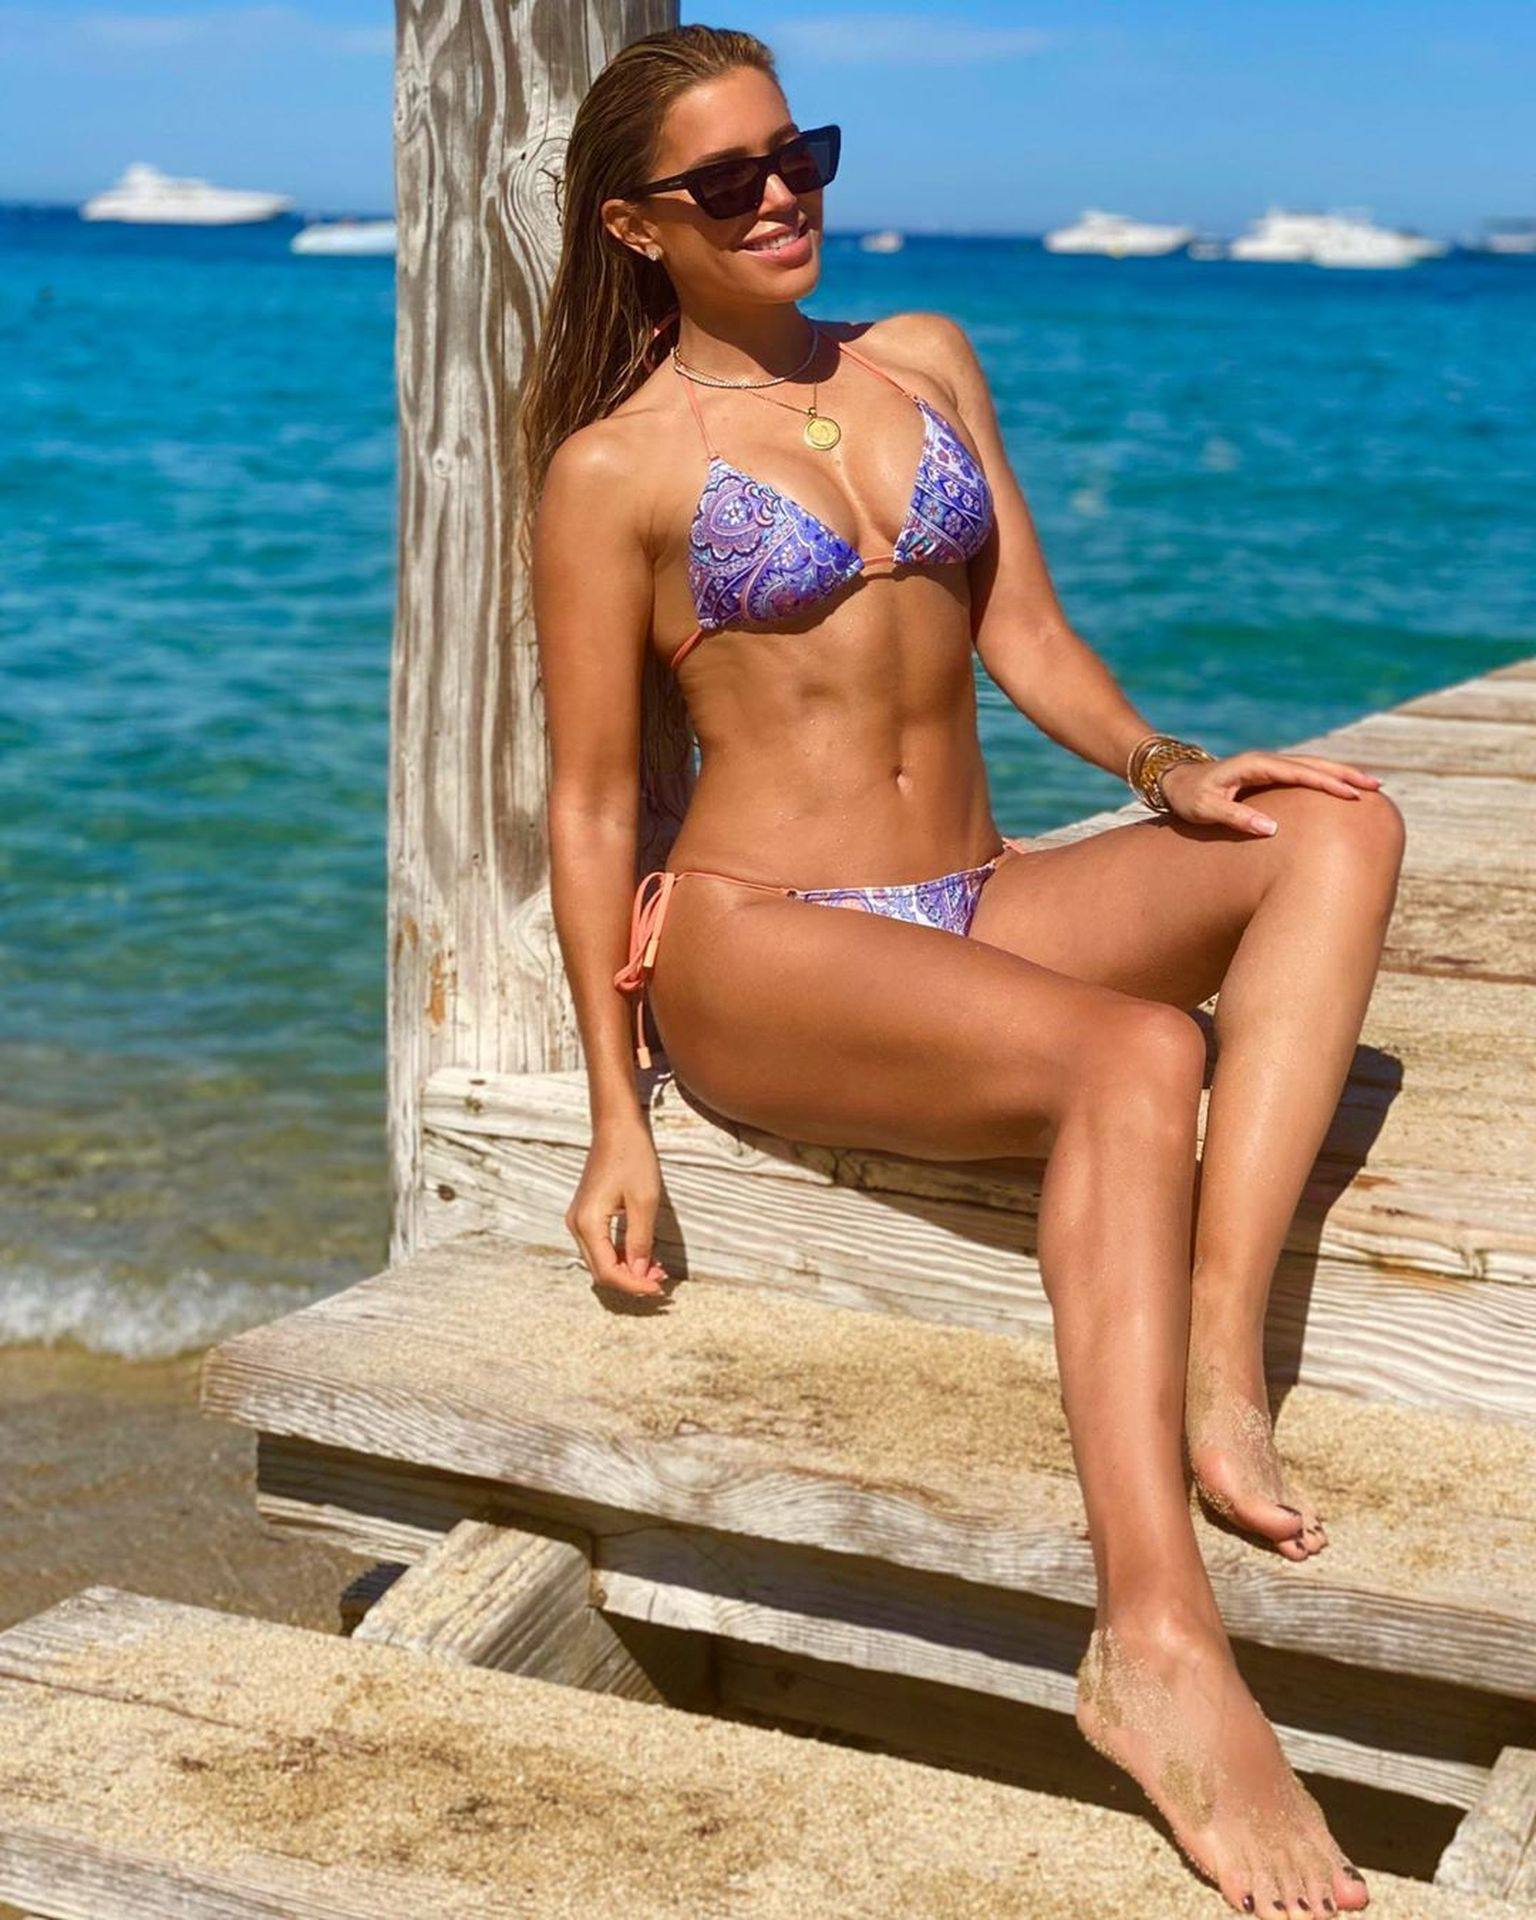 Sylvie Meis – Hot Toned Body In Sexy Bikini On The Beach In Saint Tropez 0018